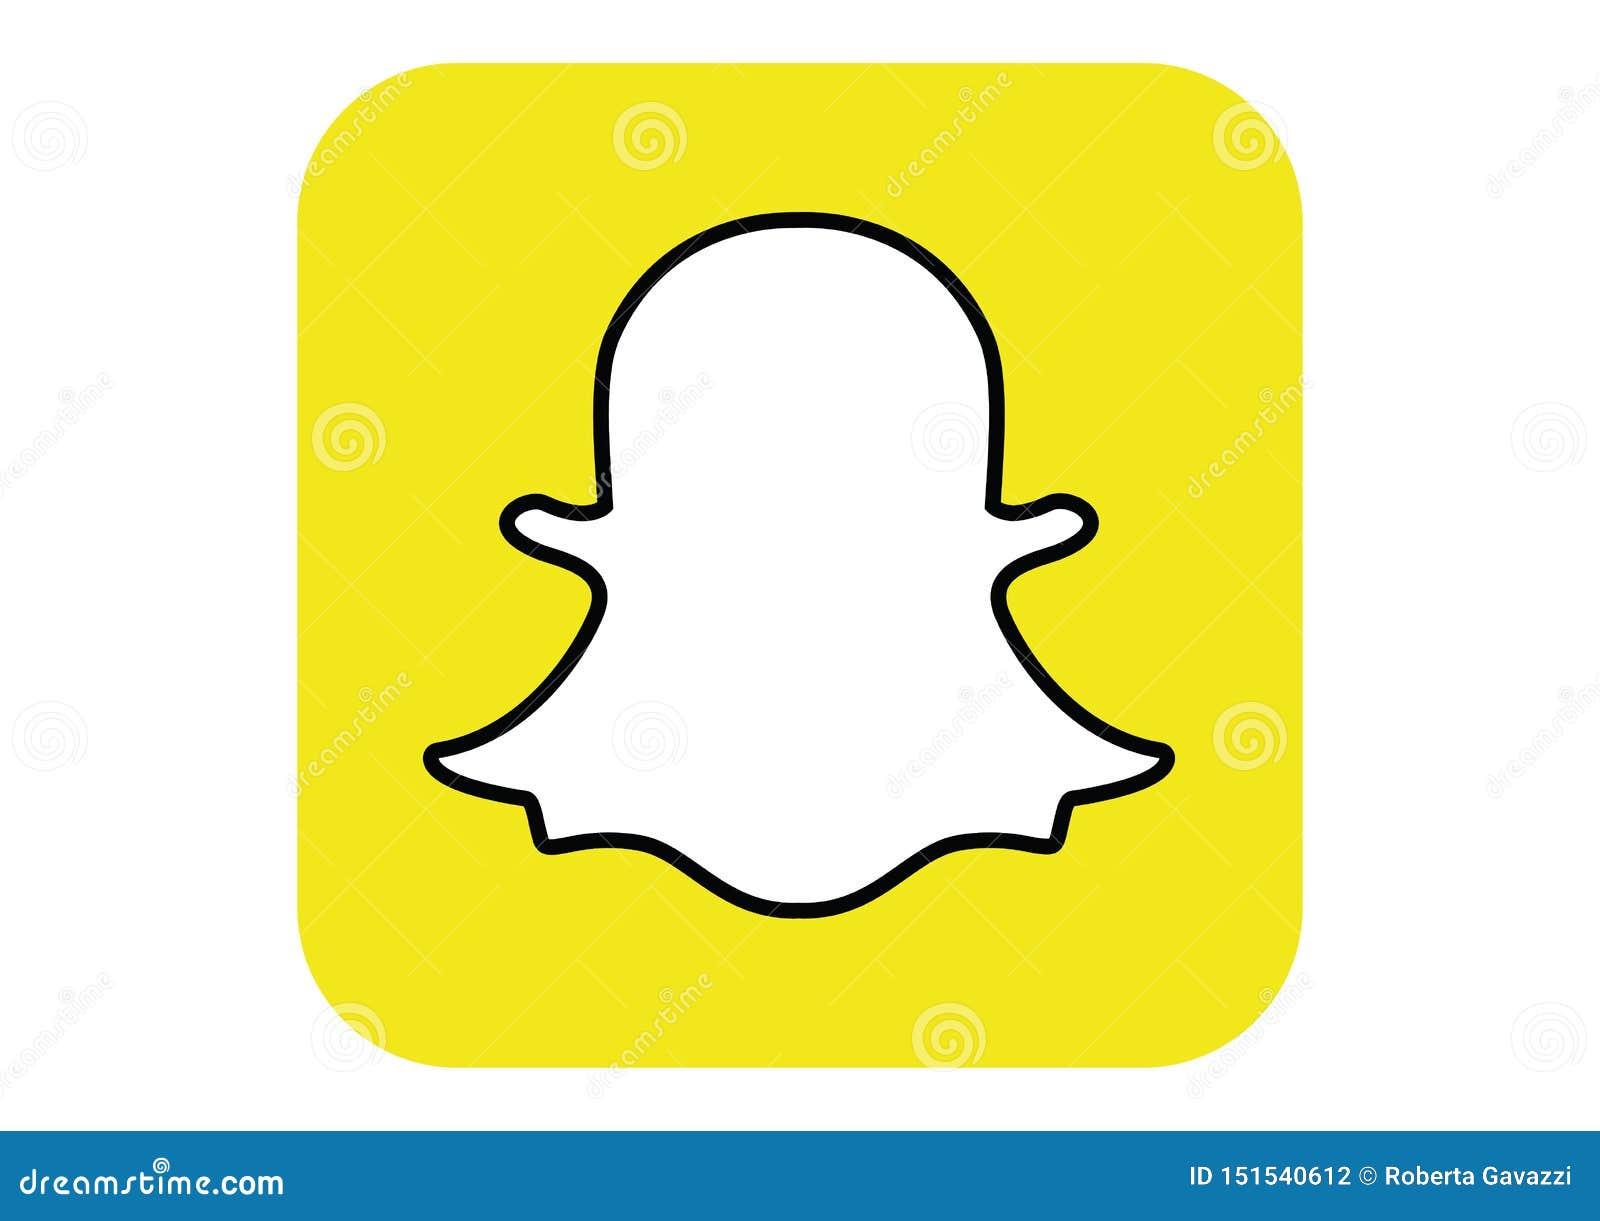 Logotipo de la red social Snapchat